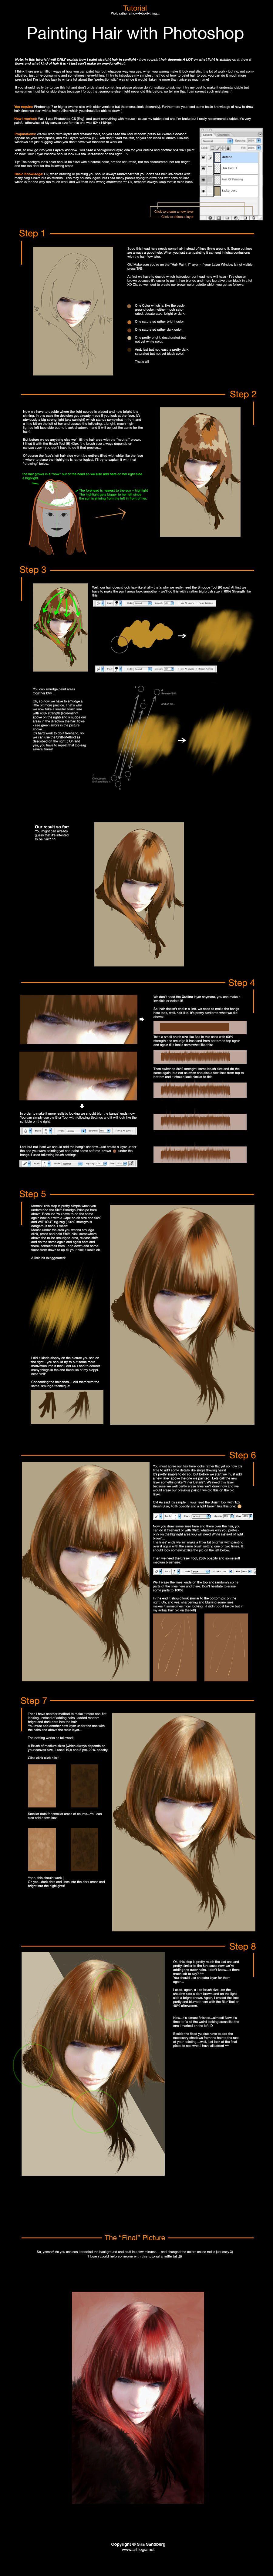 Photoshop___Painting_Hair_by_sirasan.jpg (900×8500)